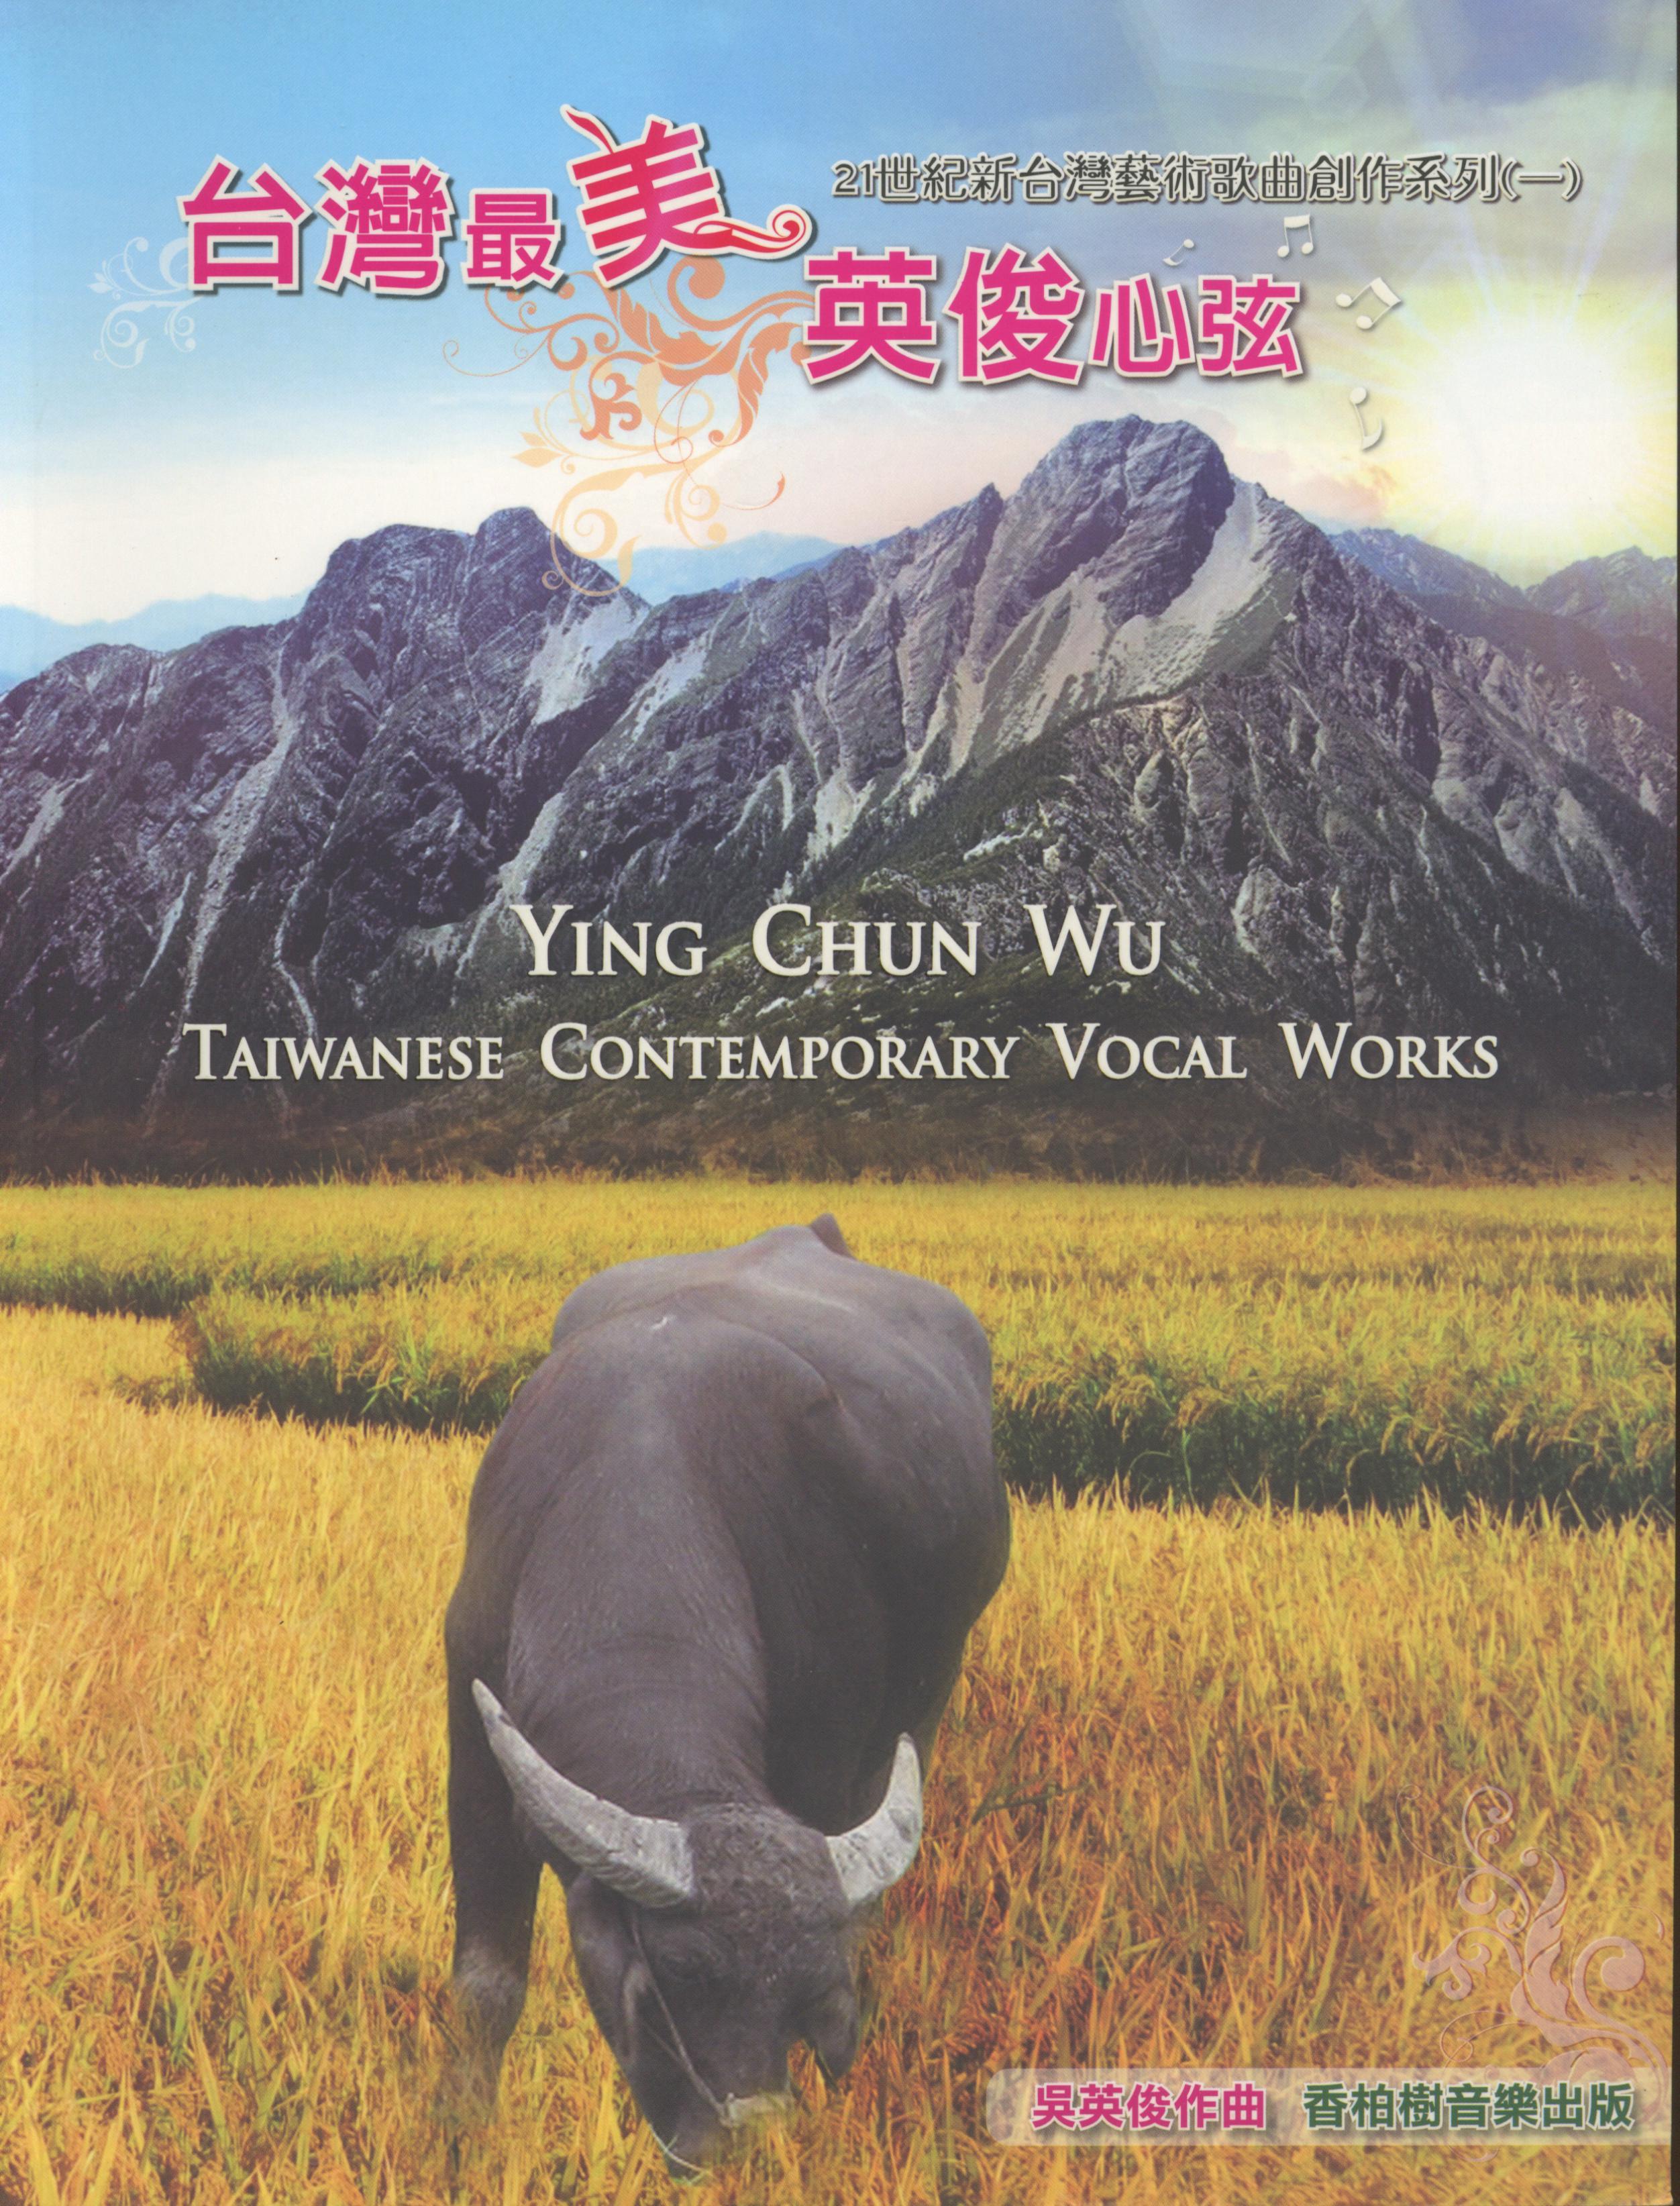 1311. 台灣最美英俊心弦 Ying Chun Wu Taiwanese Contemporary Vocal Works/吳英俊/2009